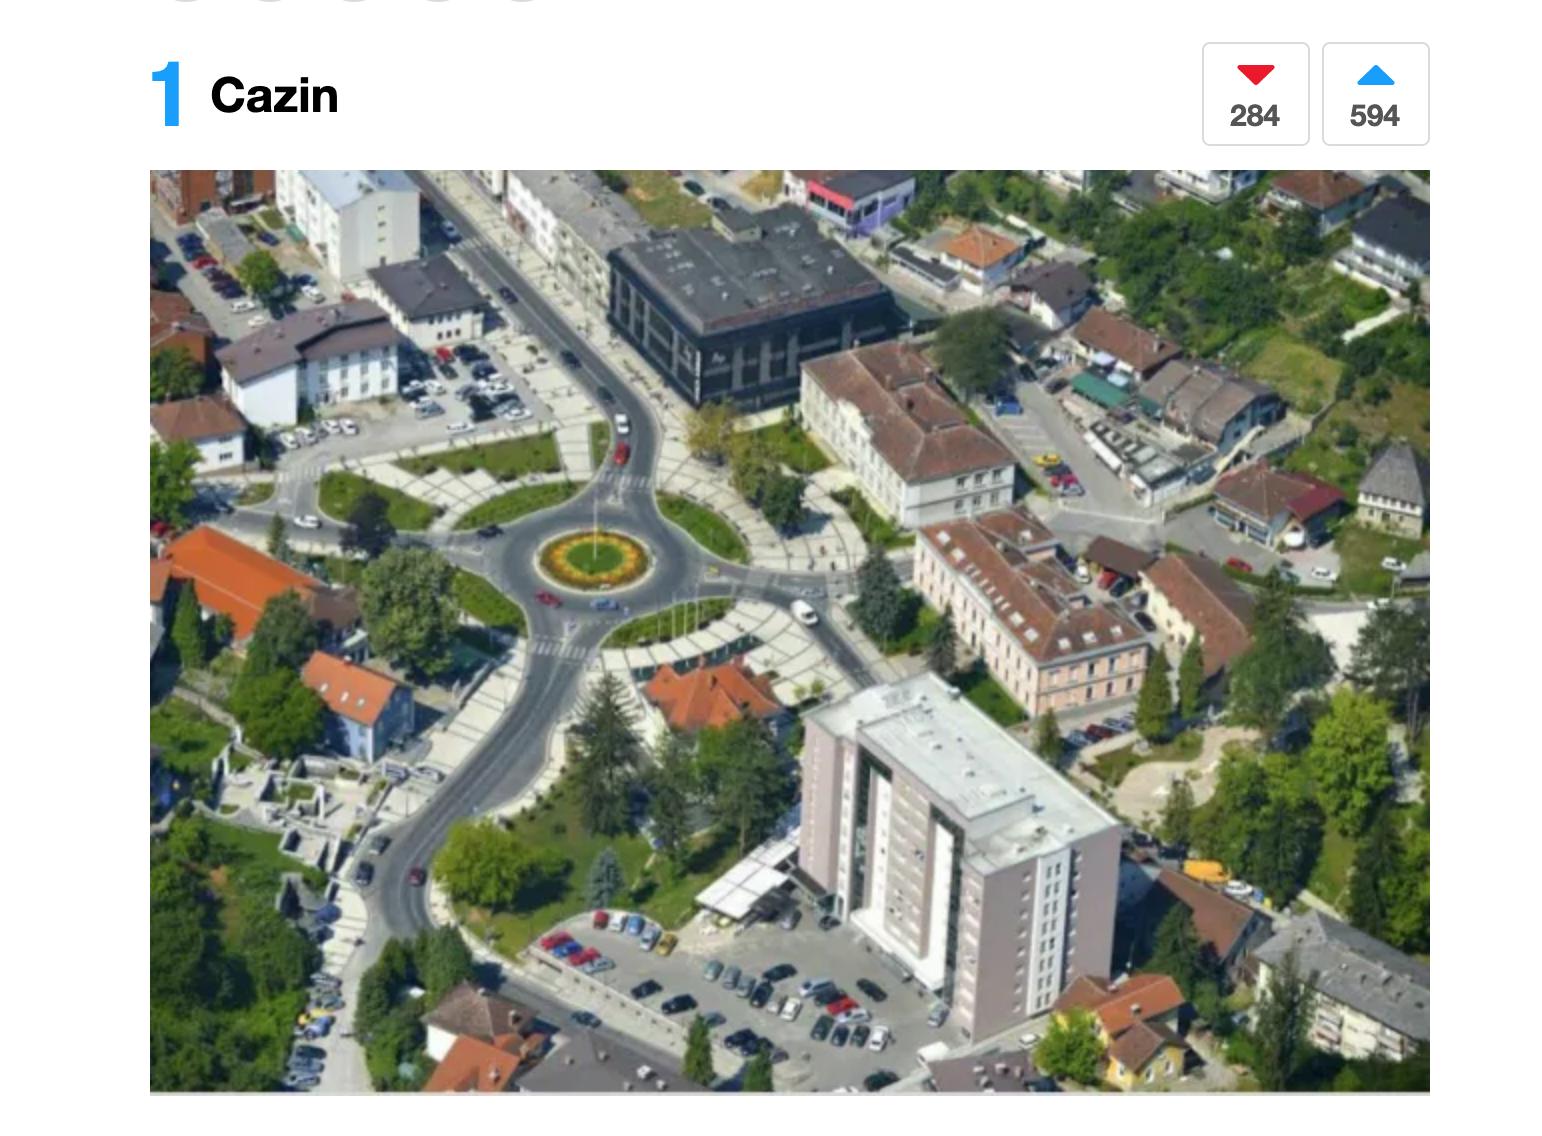 Grad Cazin